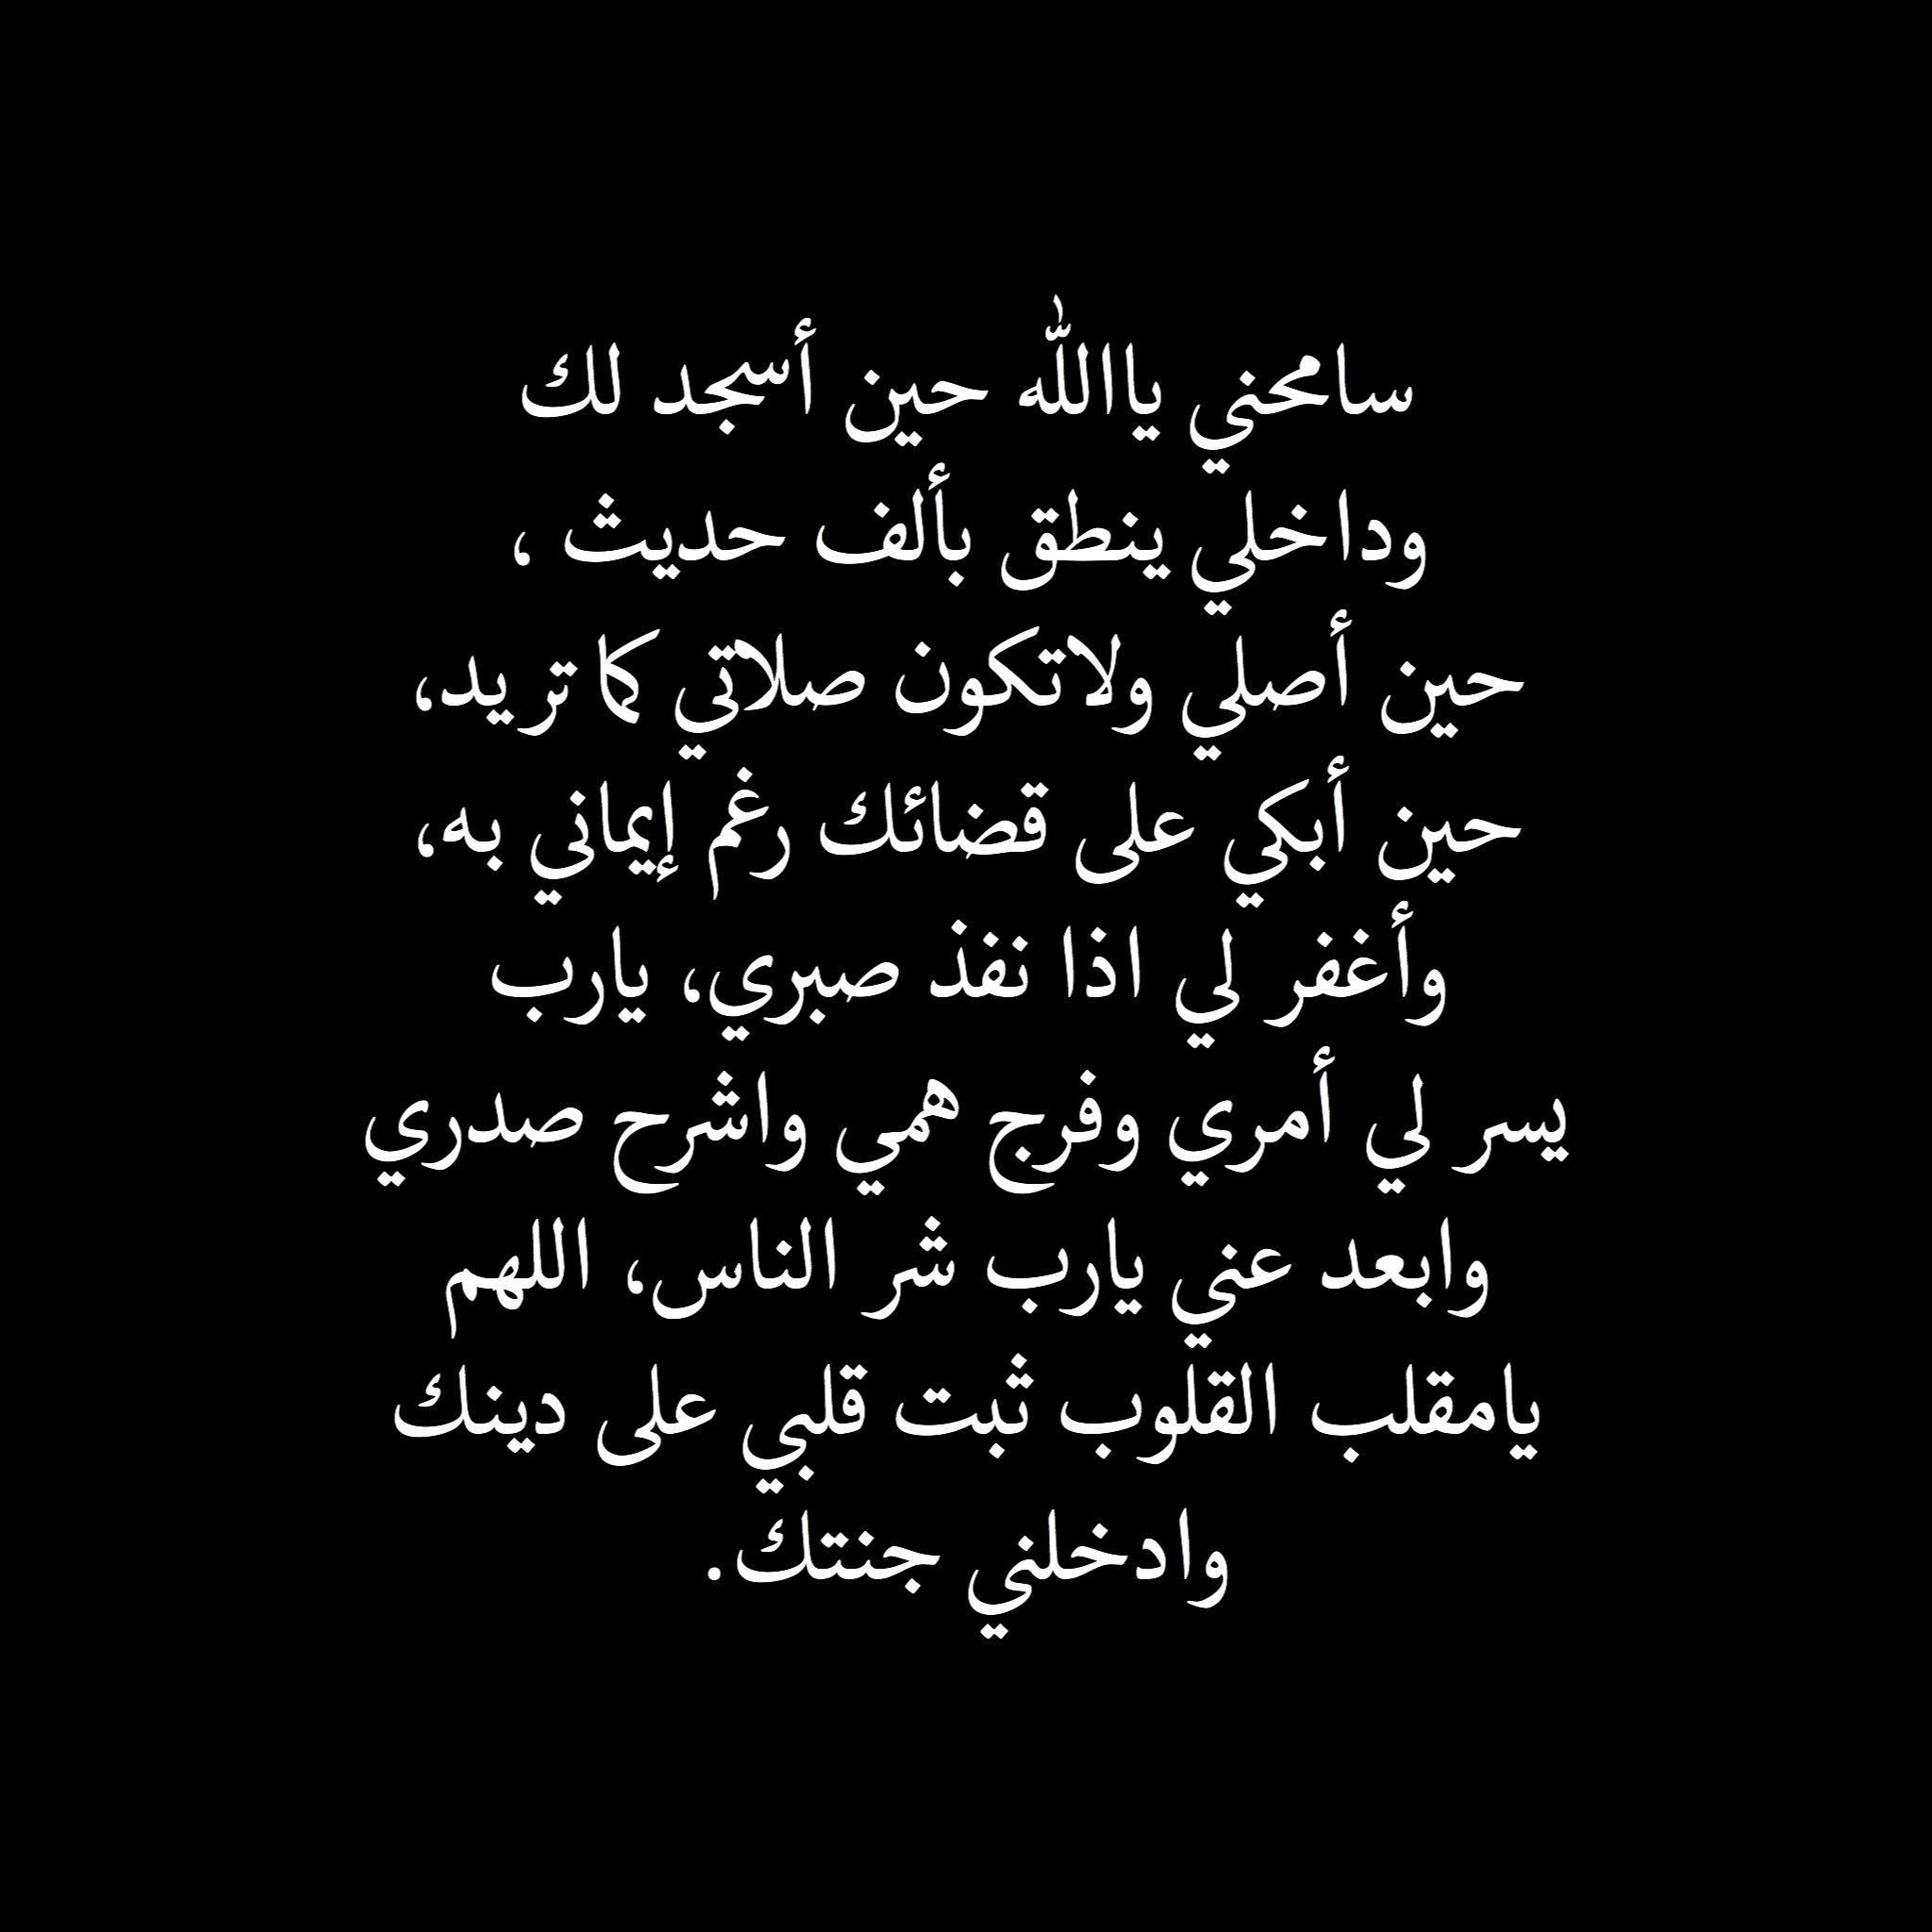 سامحني يالله عفو مغفرة اقتباسات لانك الله ابيض اسود Photo Quotes Quran Quotes Arabic Love Quotes